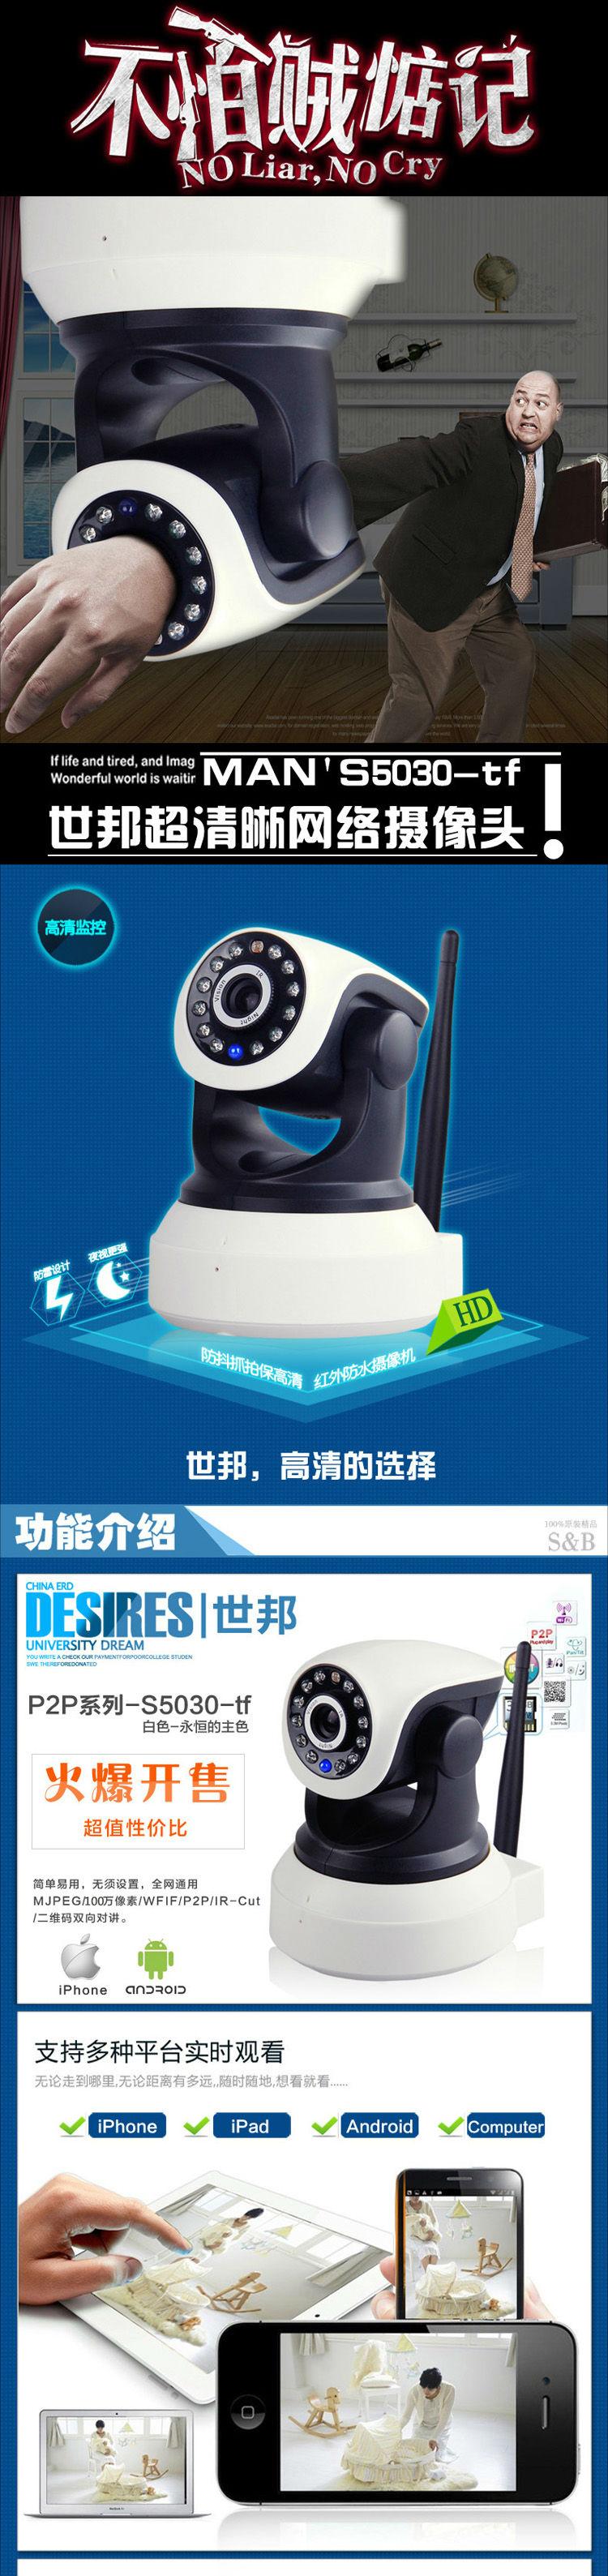 wifi无线网络摄像机,看家神器